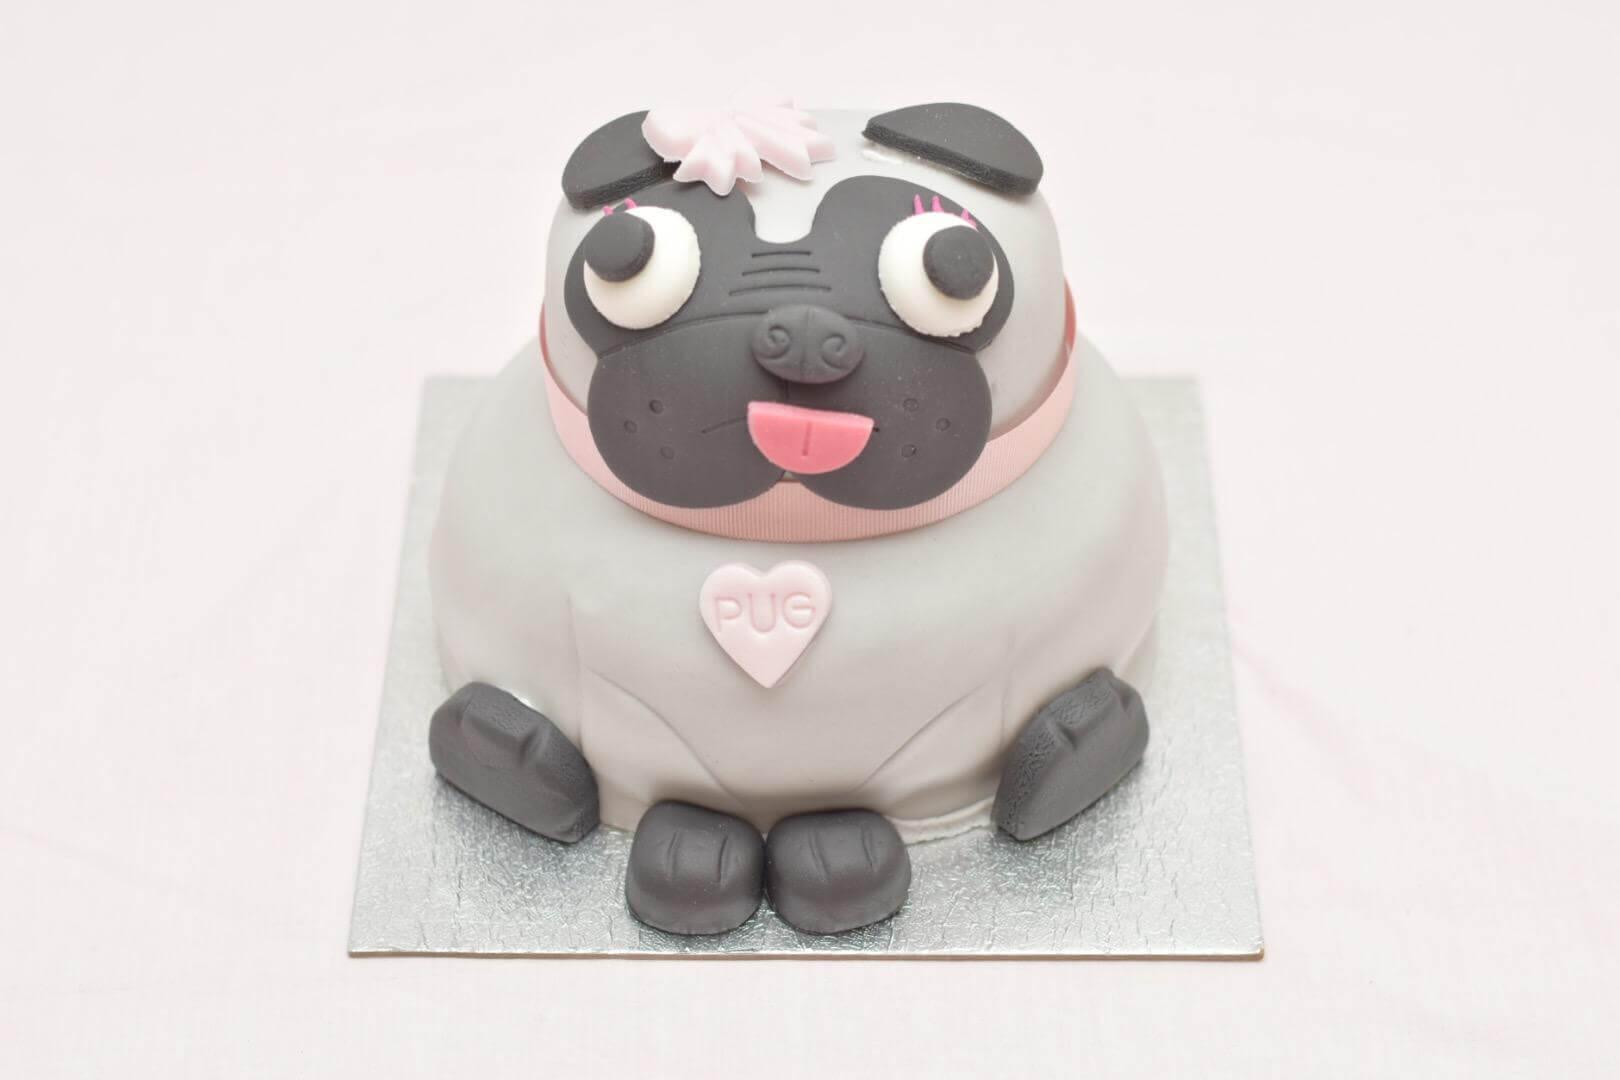 Asda Make Own Cake